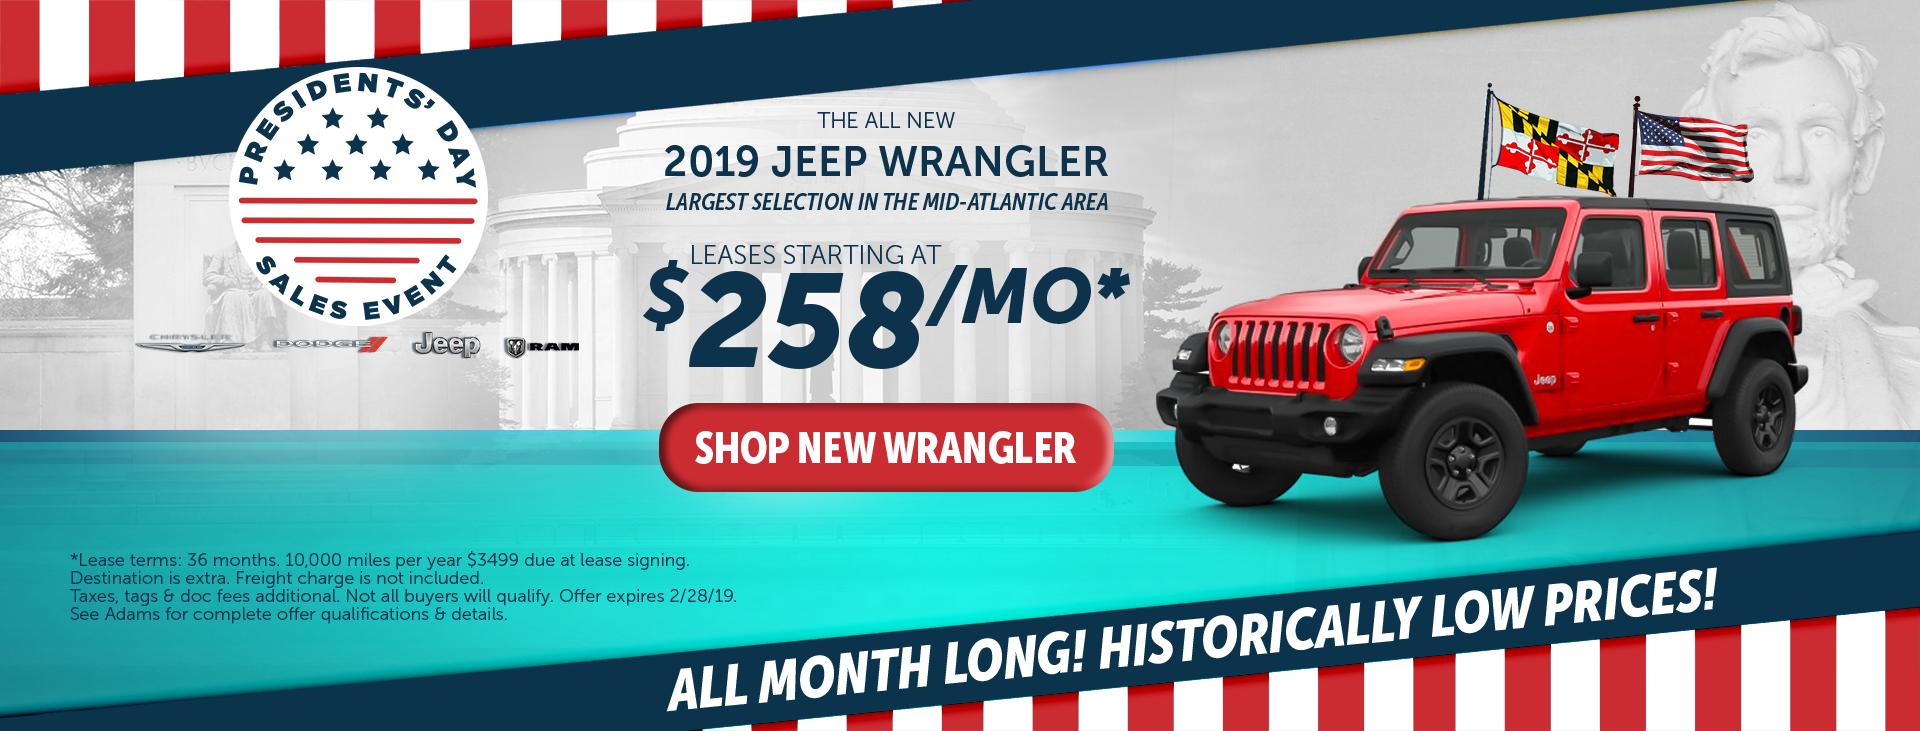 adams chrysler dodge jeep ram 2019 jeep wrangler